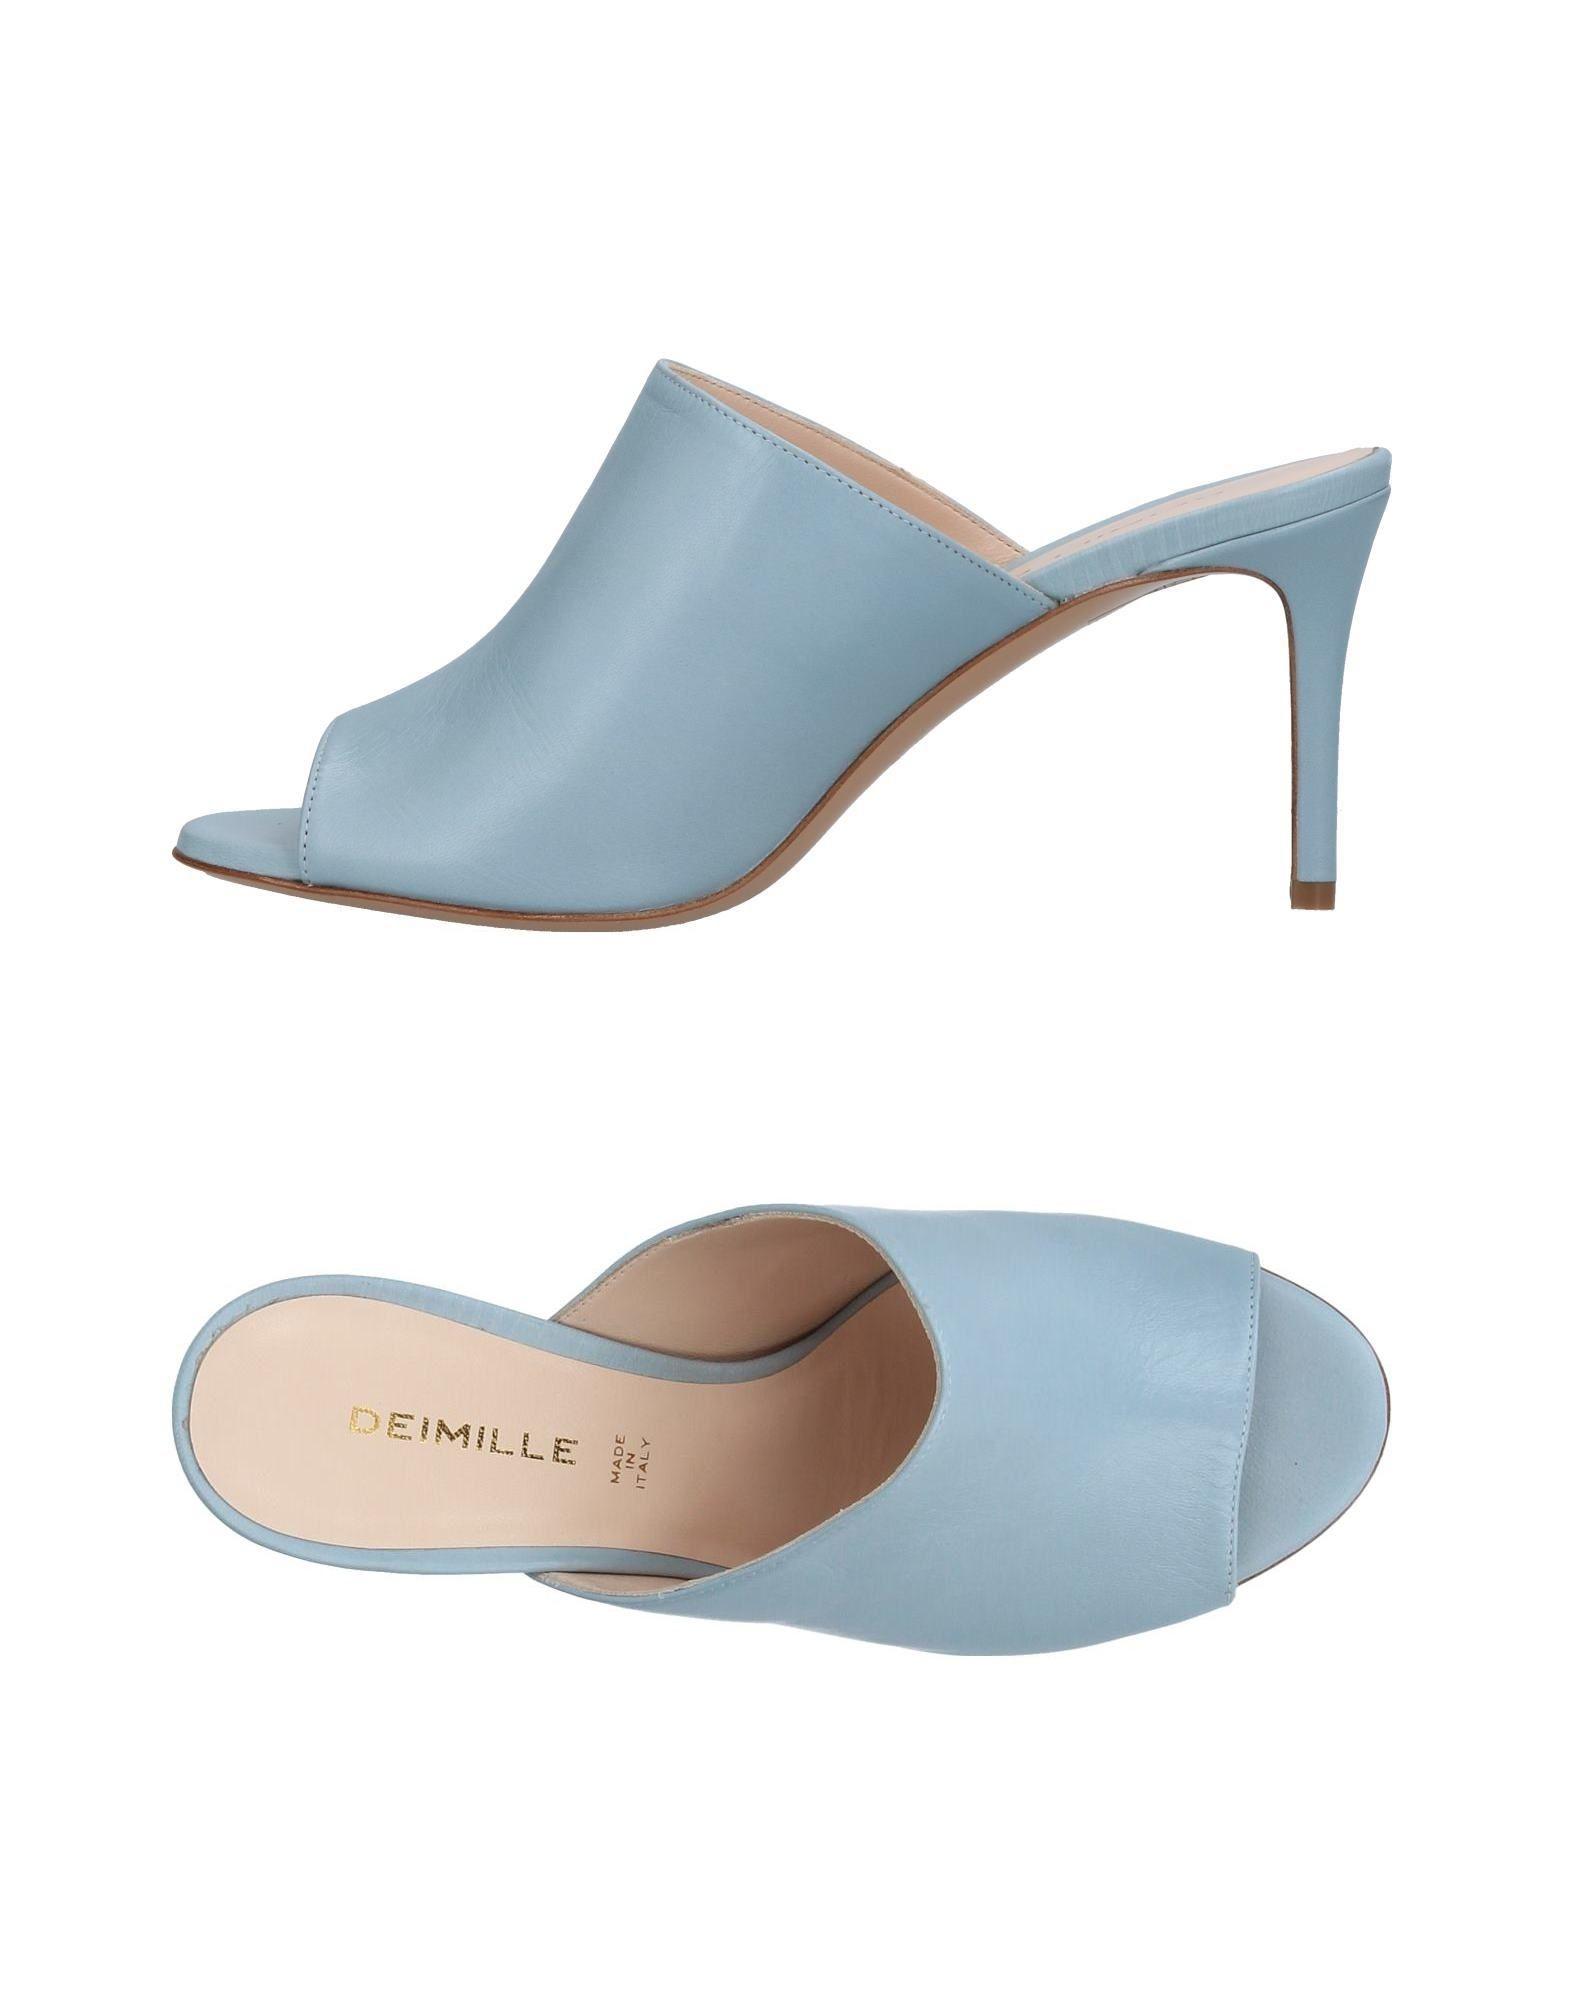 Deimille Sandalen Damen  11376529GR Gute Qualität beliebte Schuhe